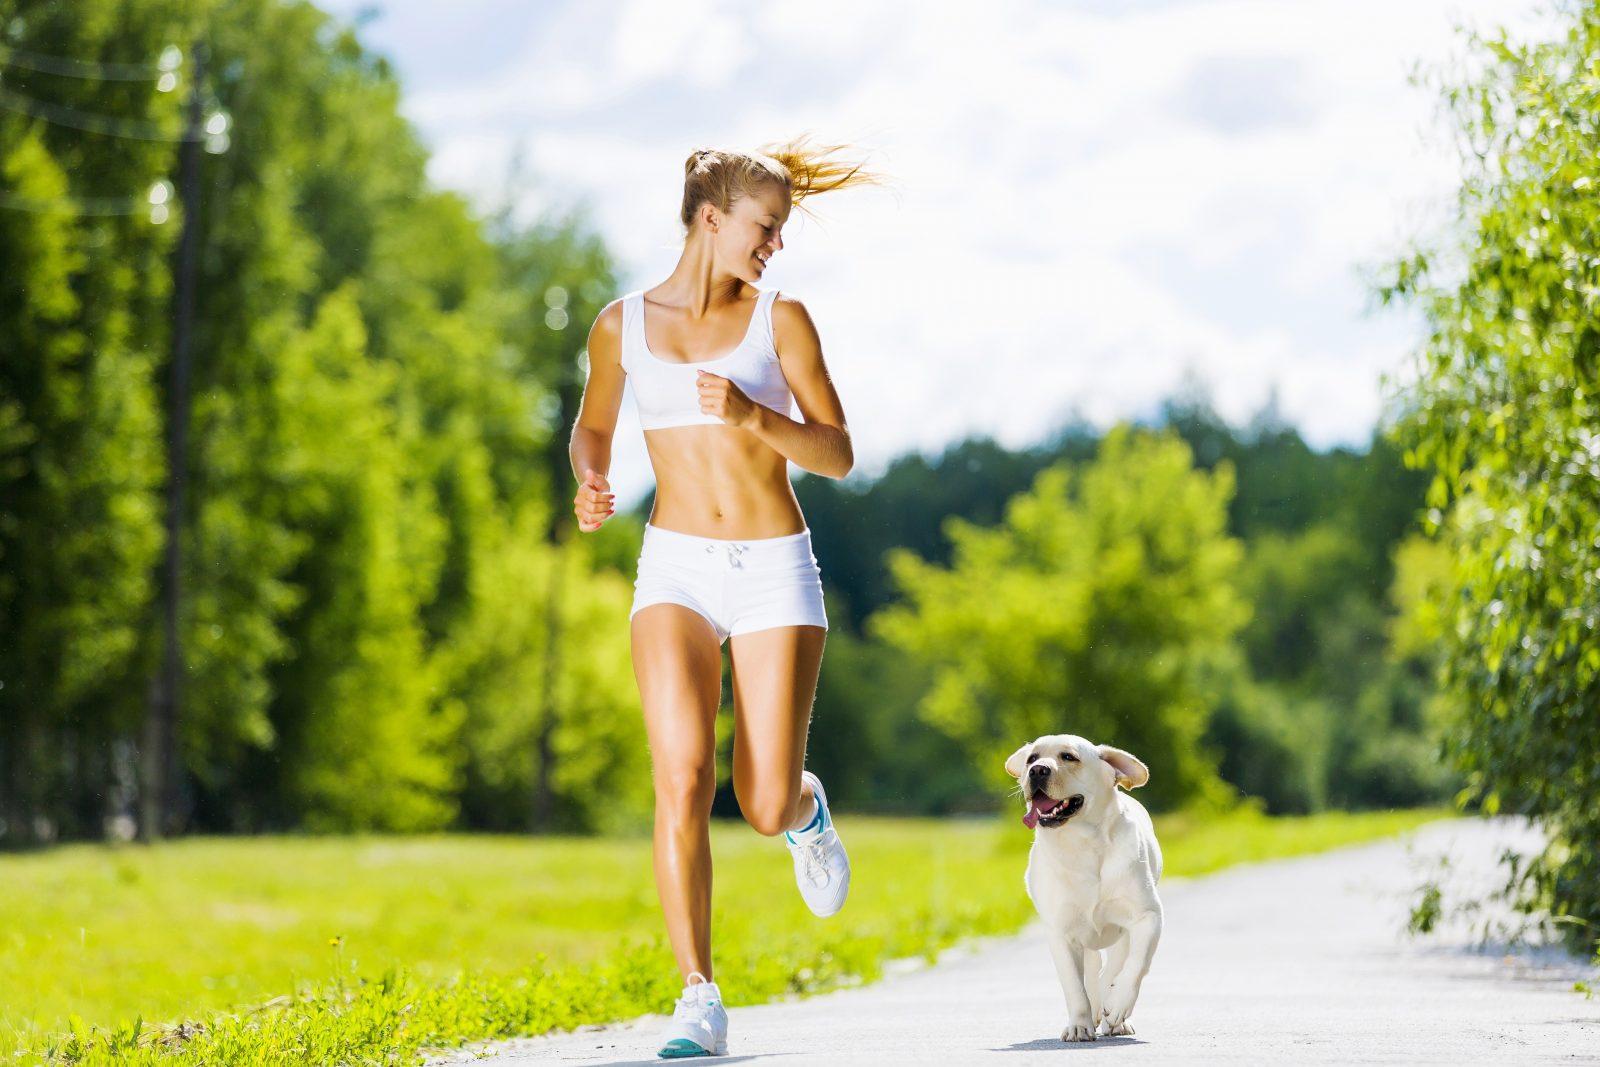 Девушка и собачка делают утреннюю пробежку на природе